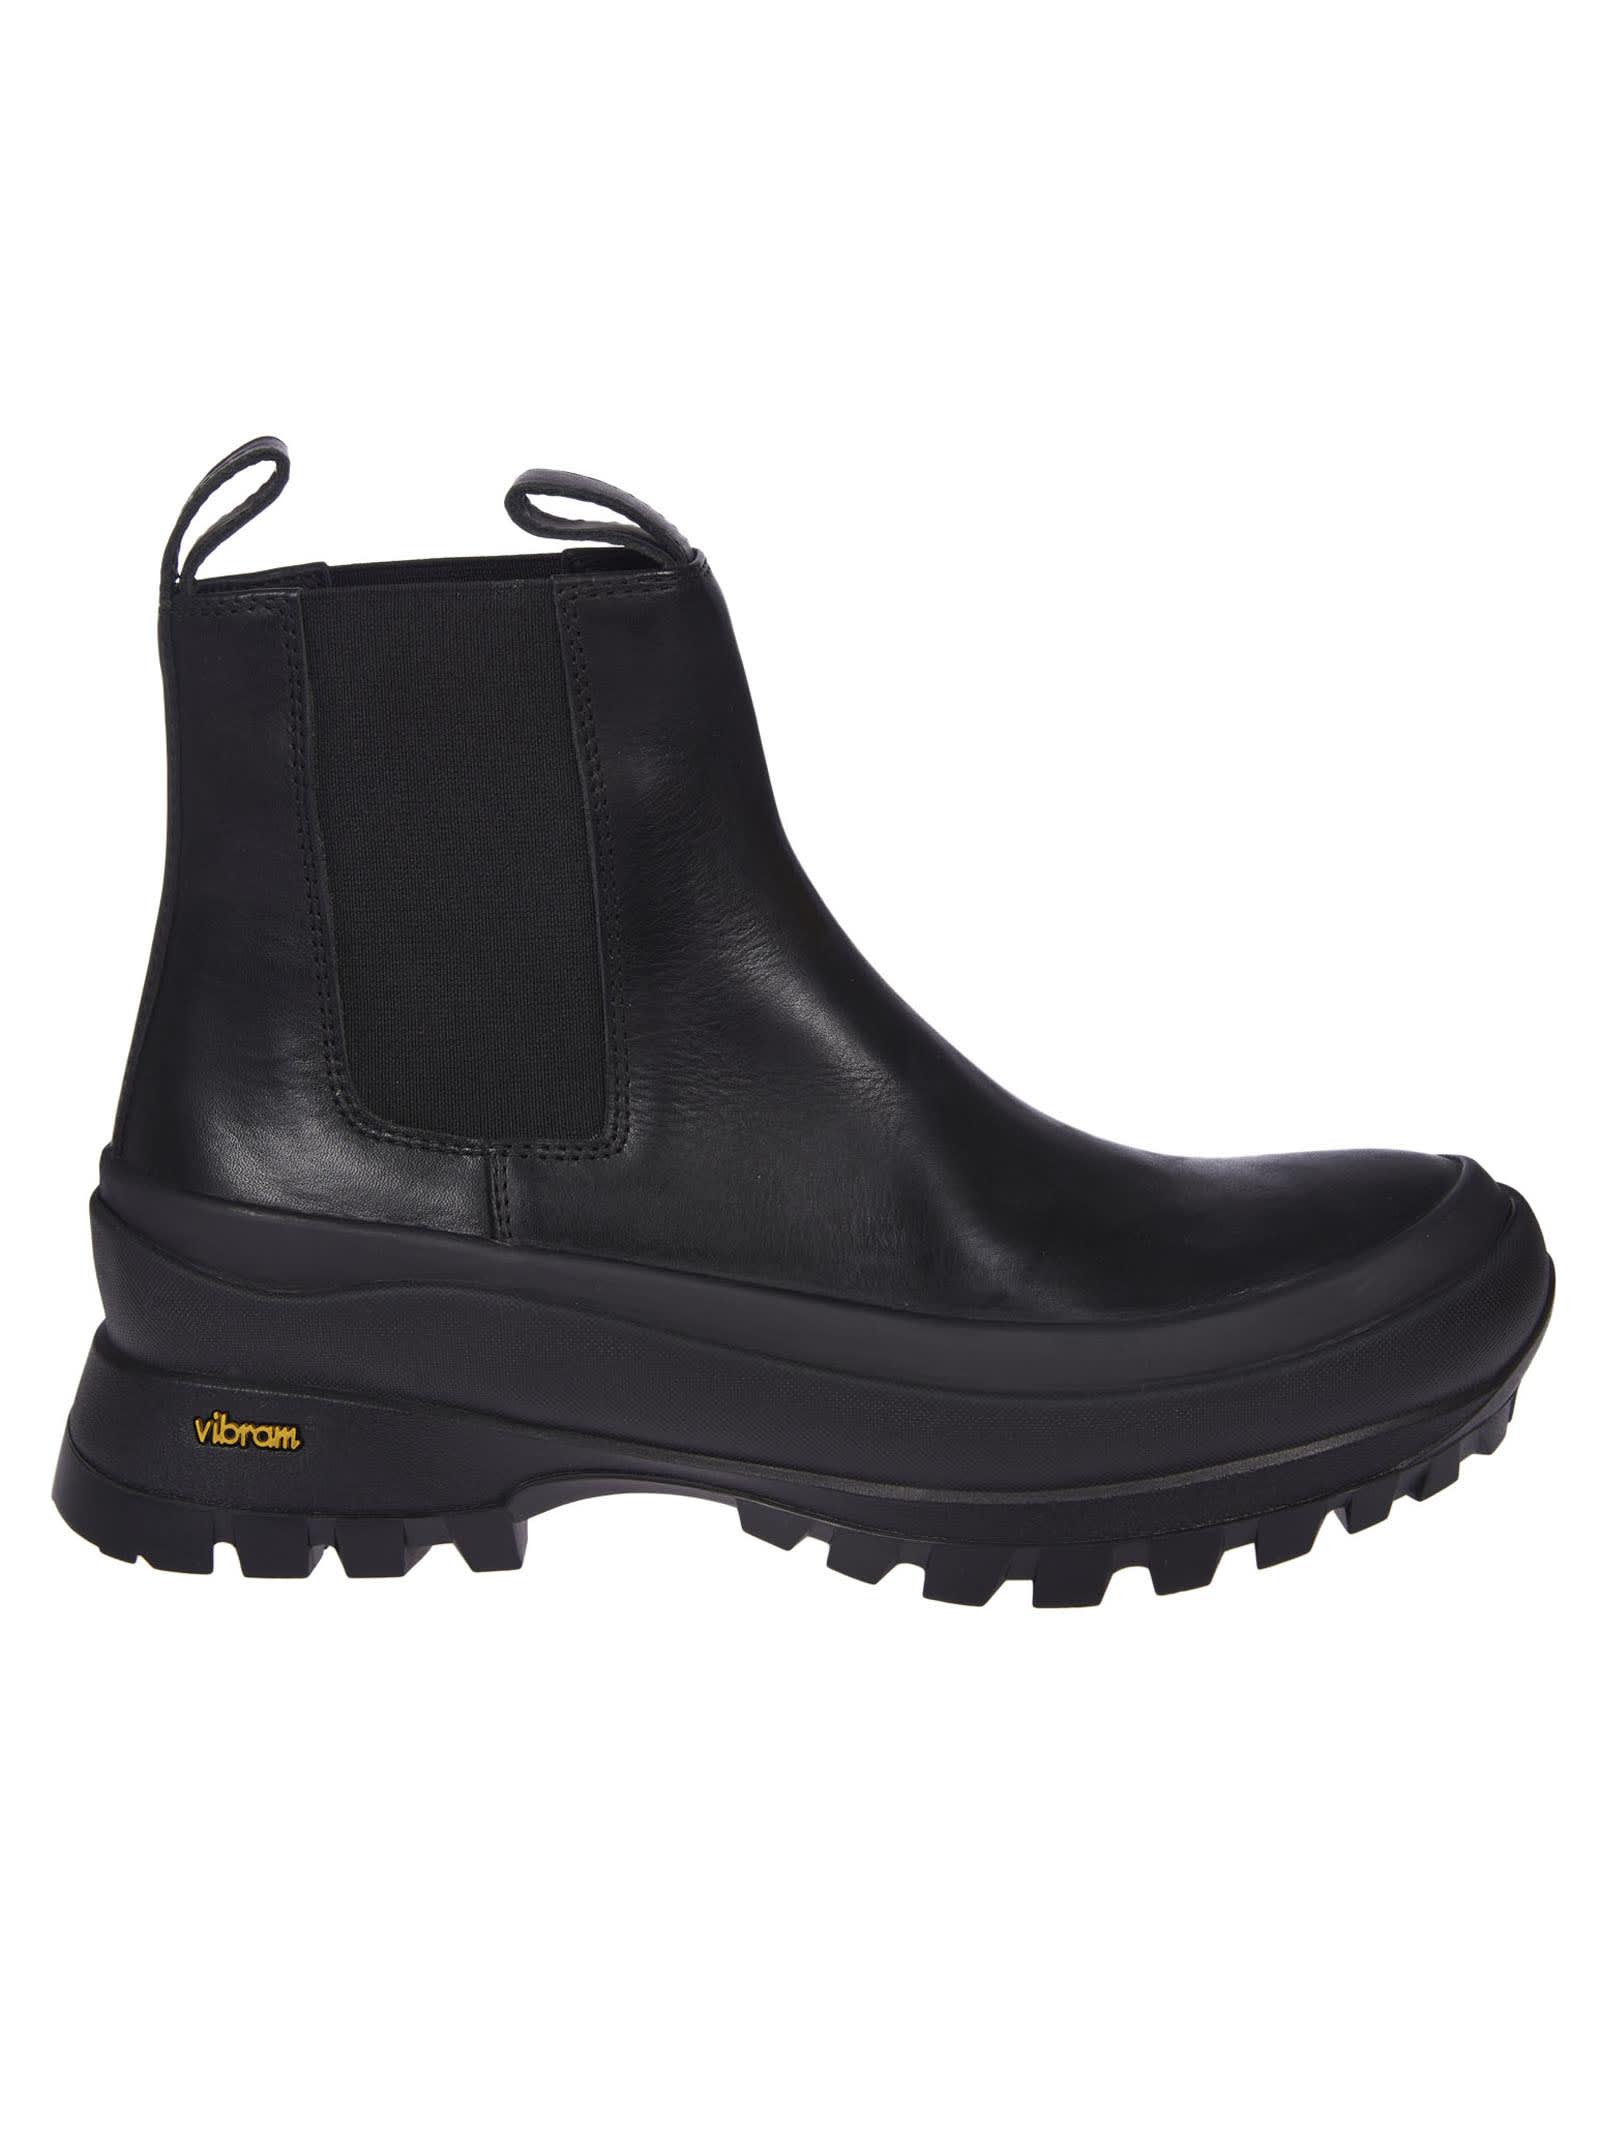 Buy Jil Sander Elasticated Side Panel Ankle Boots online, shop Jil Sander shoes with free shipping